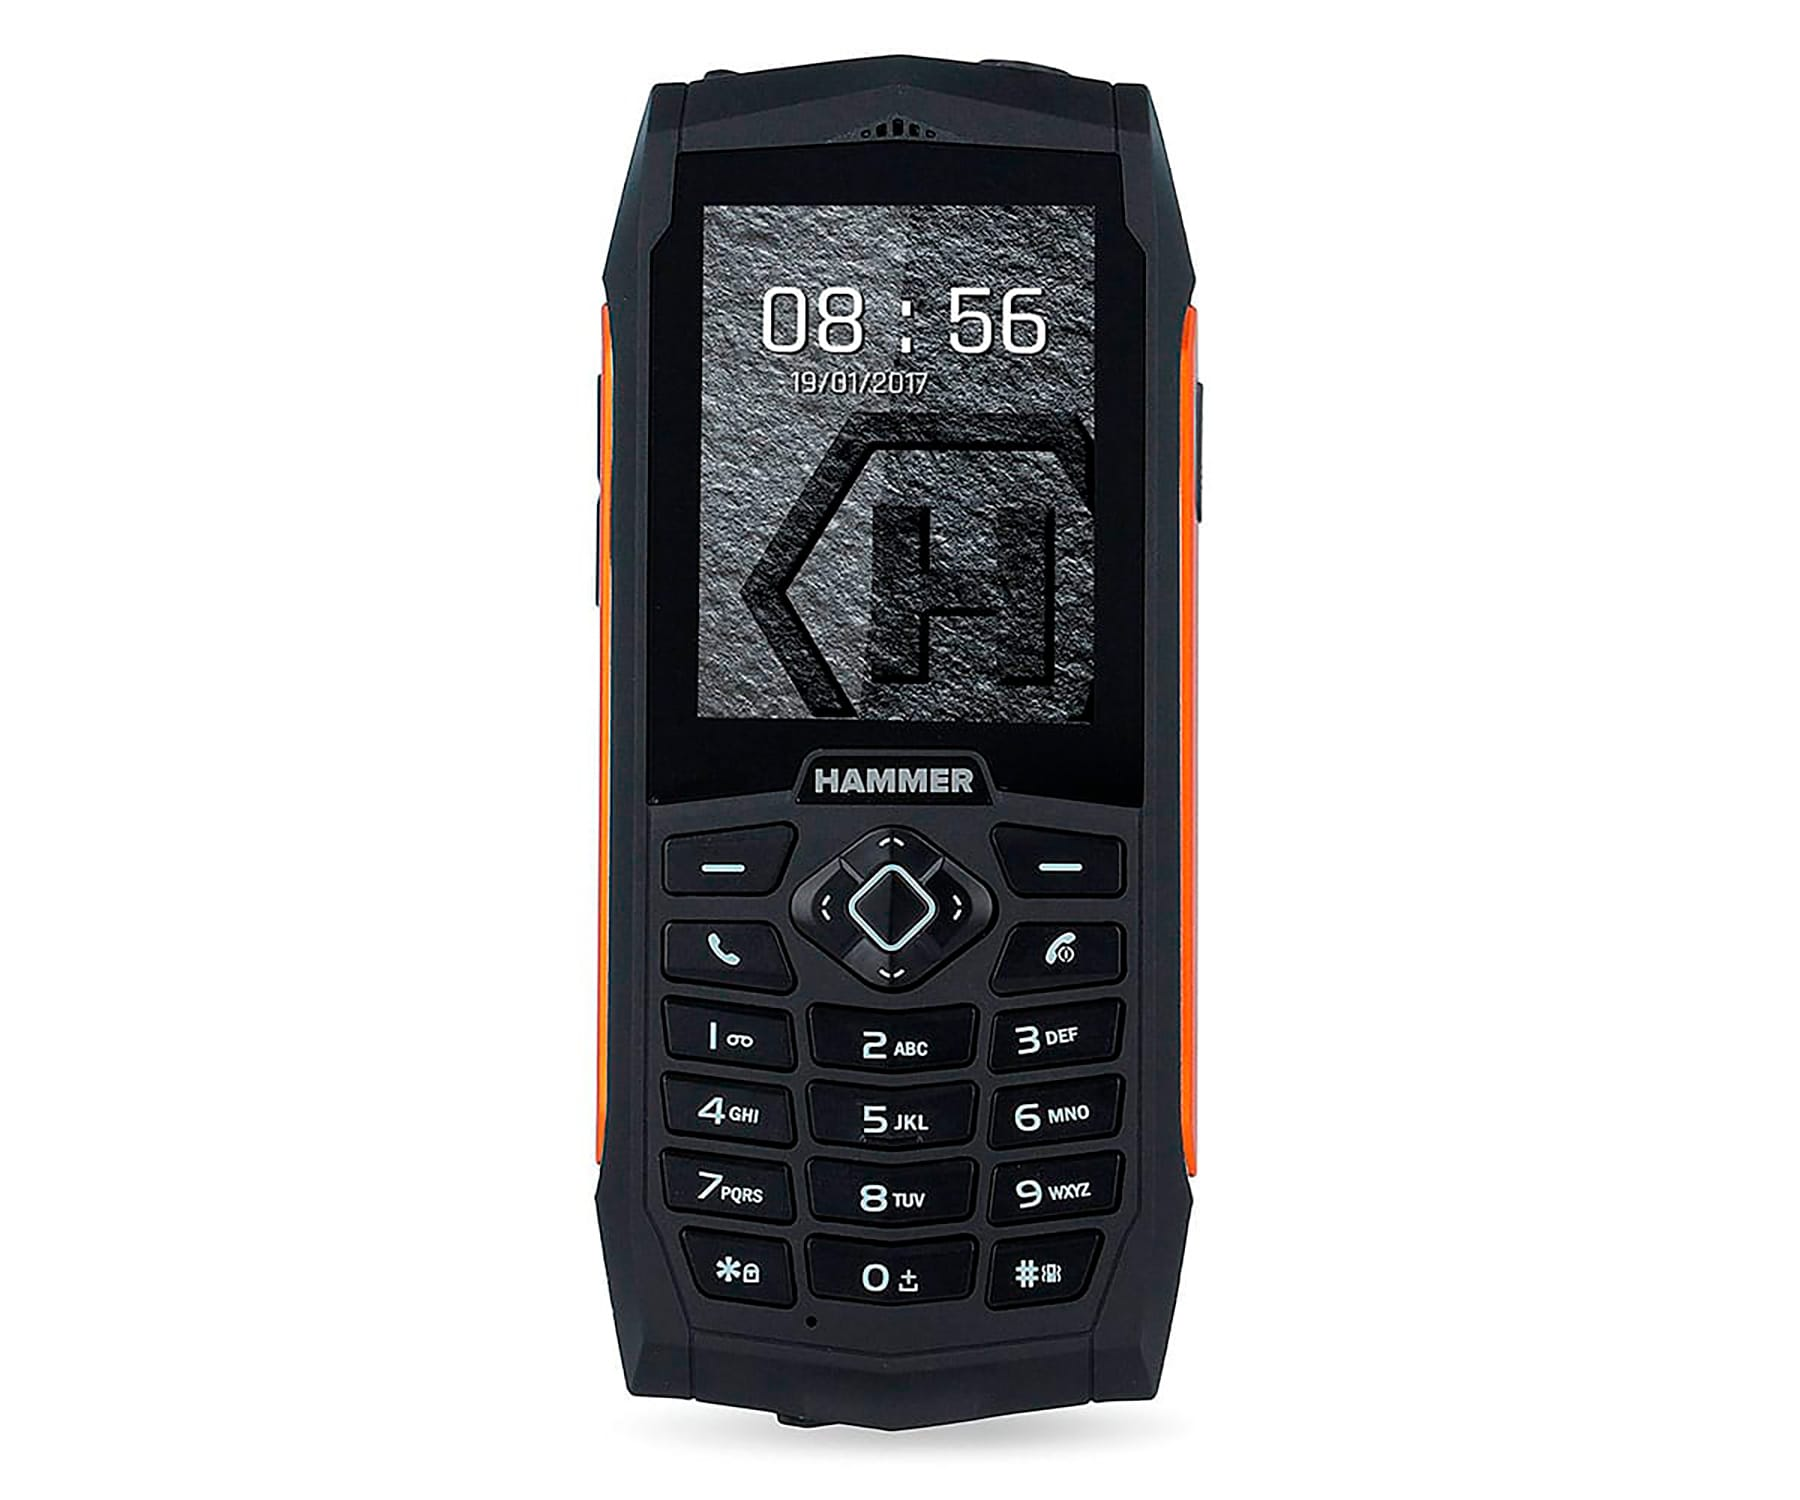 MYPHONE HAMMER 3 NEGRO NARANJA MÓVIL RESISTENTE IP68 DUAL SIM 2.4 TFT CÁMARA VGA BLUETOOTH RADIO F